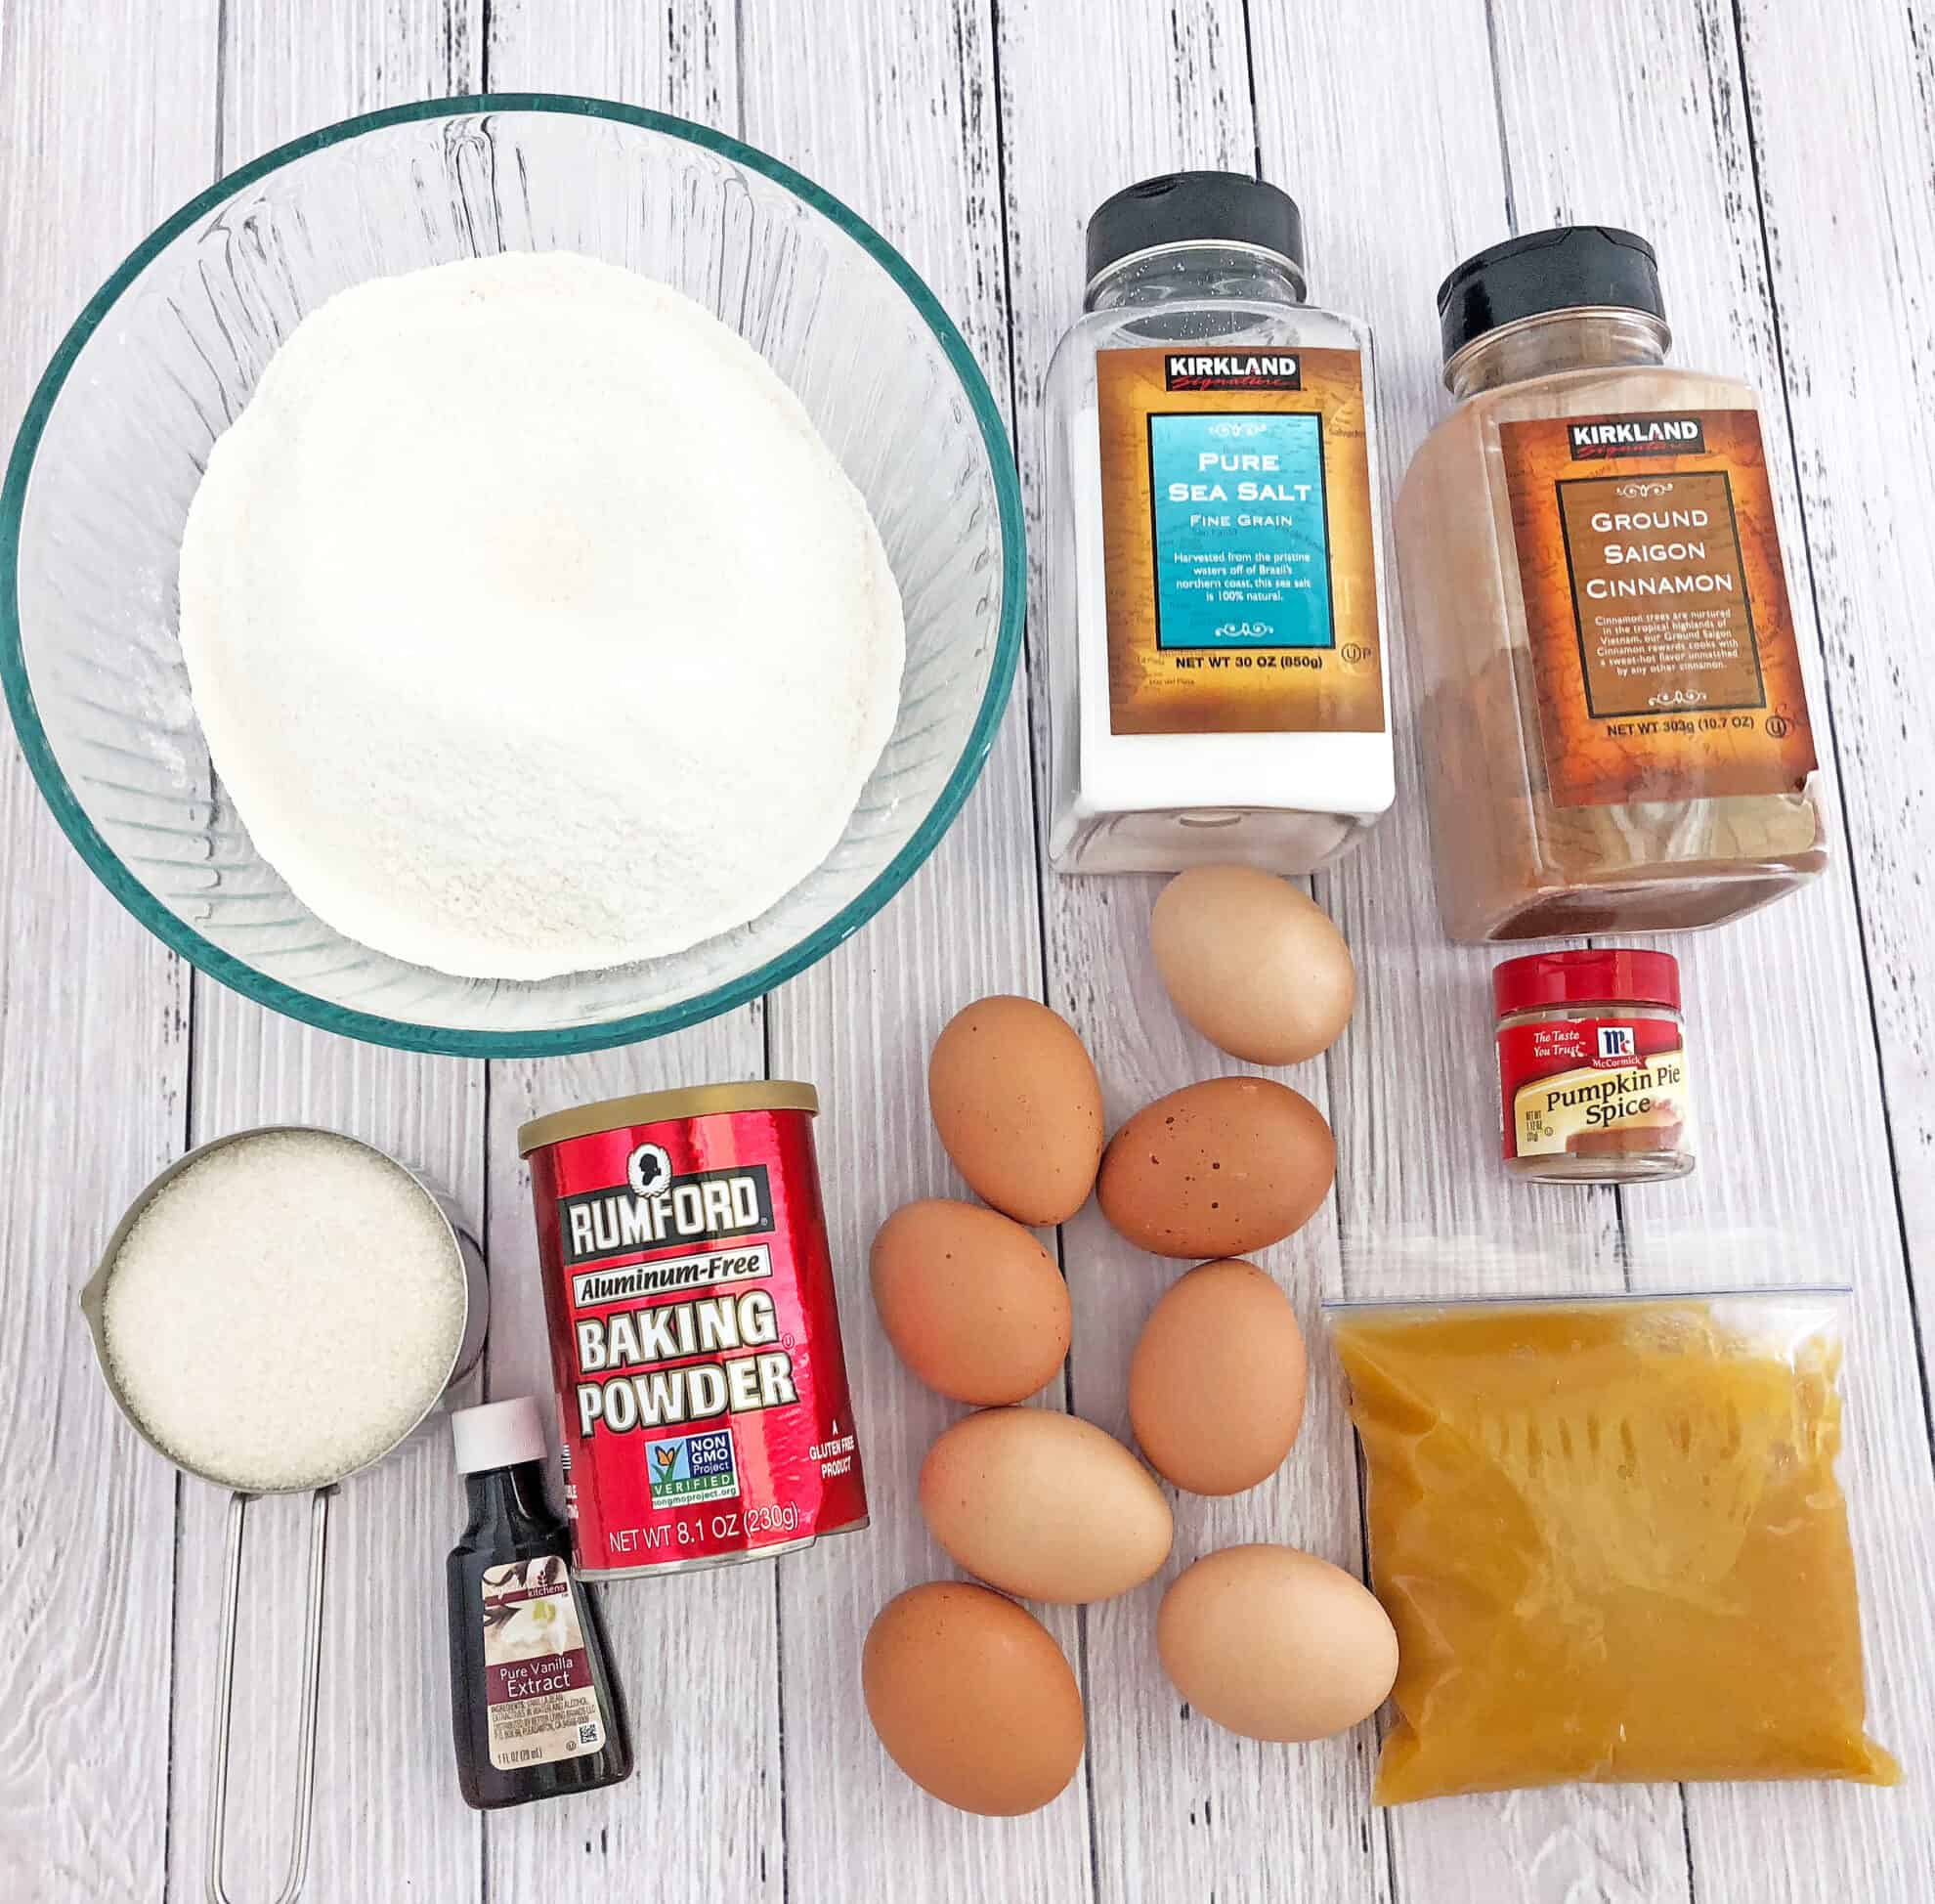 Ingredients for the Tiramisu Pumpkin Cake Recipe #pumpkintiramisucake #fallbaking #easycakerecipe #valyastasteofhome